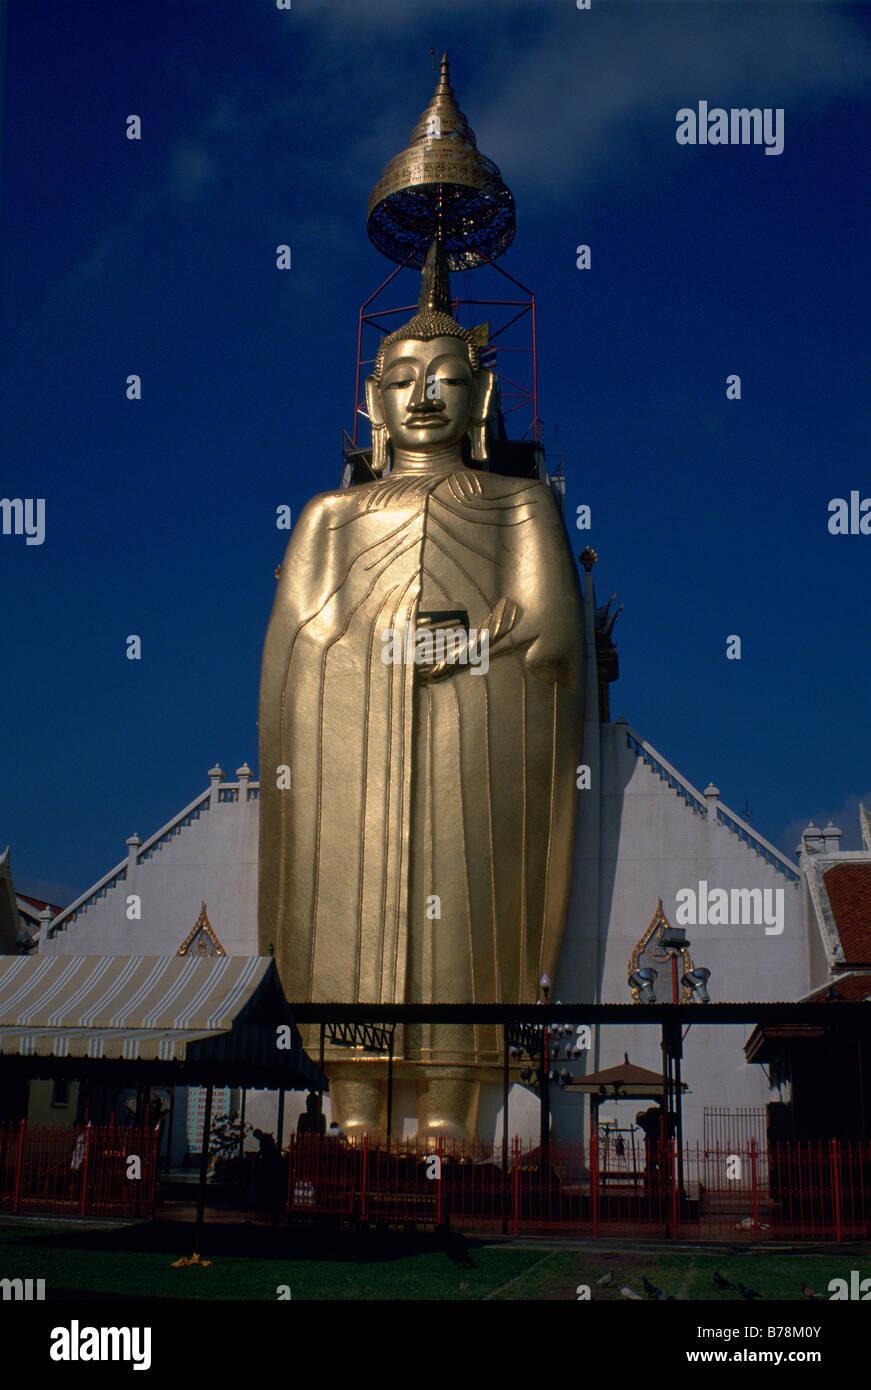 Golden Buddha statue,standing 32 meters,in Wat Intharawihan,Bangkok,Thailand - Stock Image